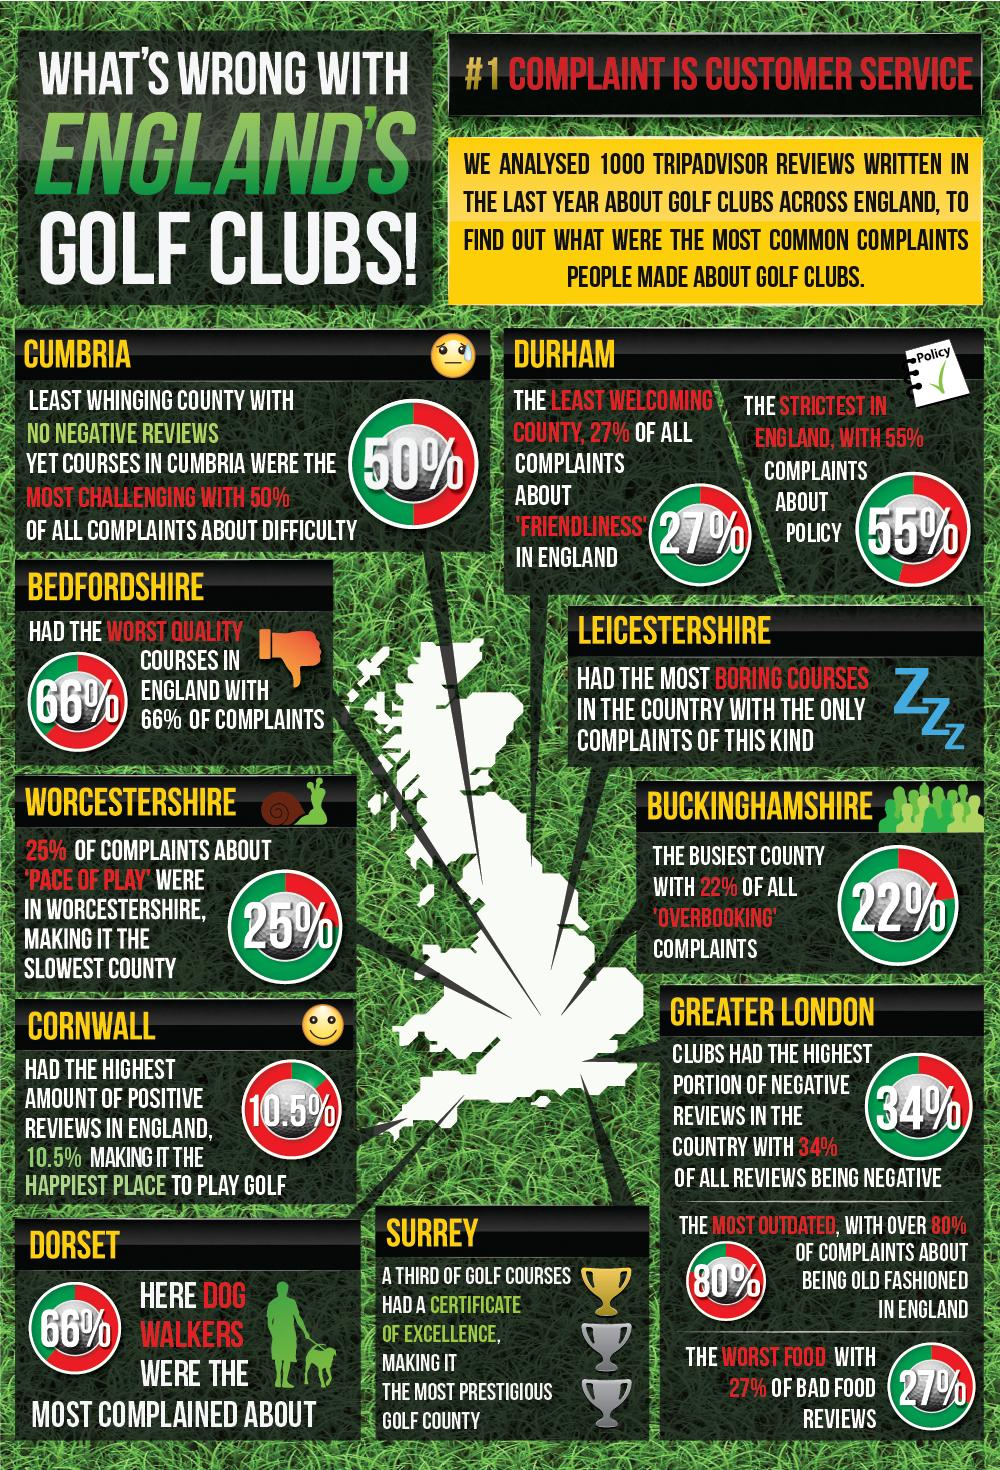 Golf club TripAdvisor review study infographic